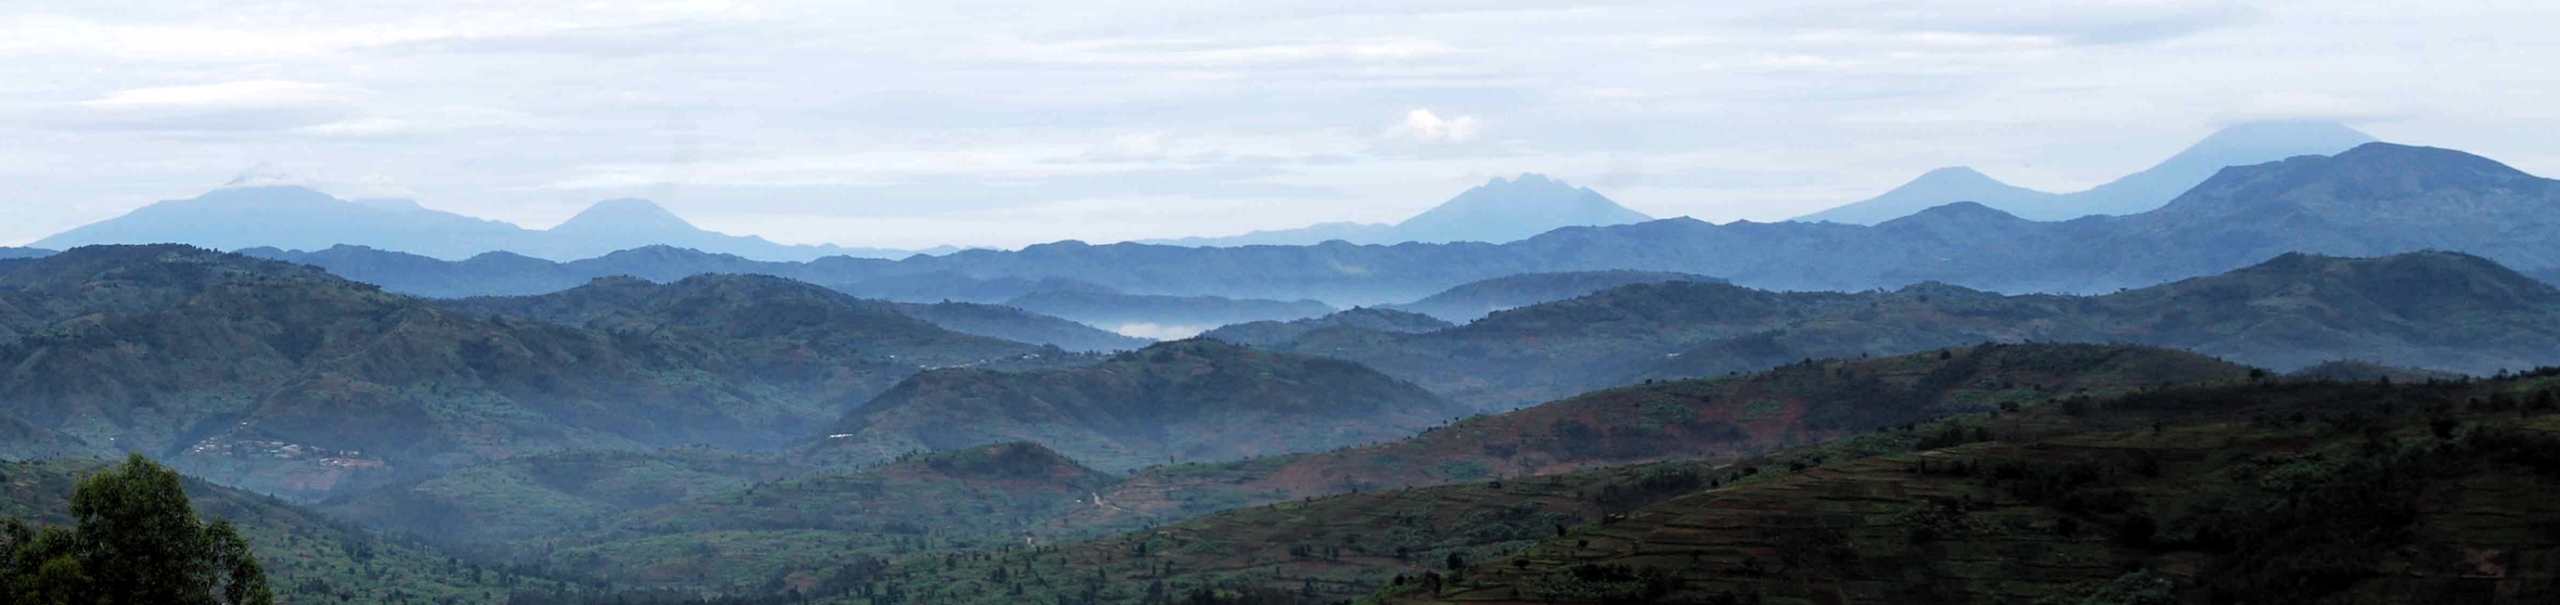 Rwanda vista dels volcans Virunga